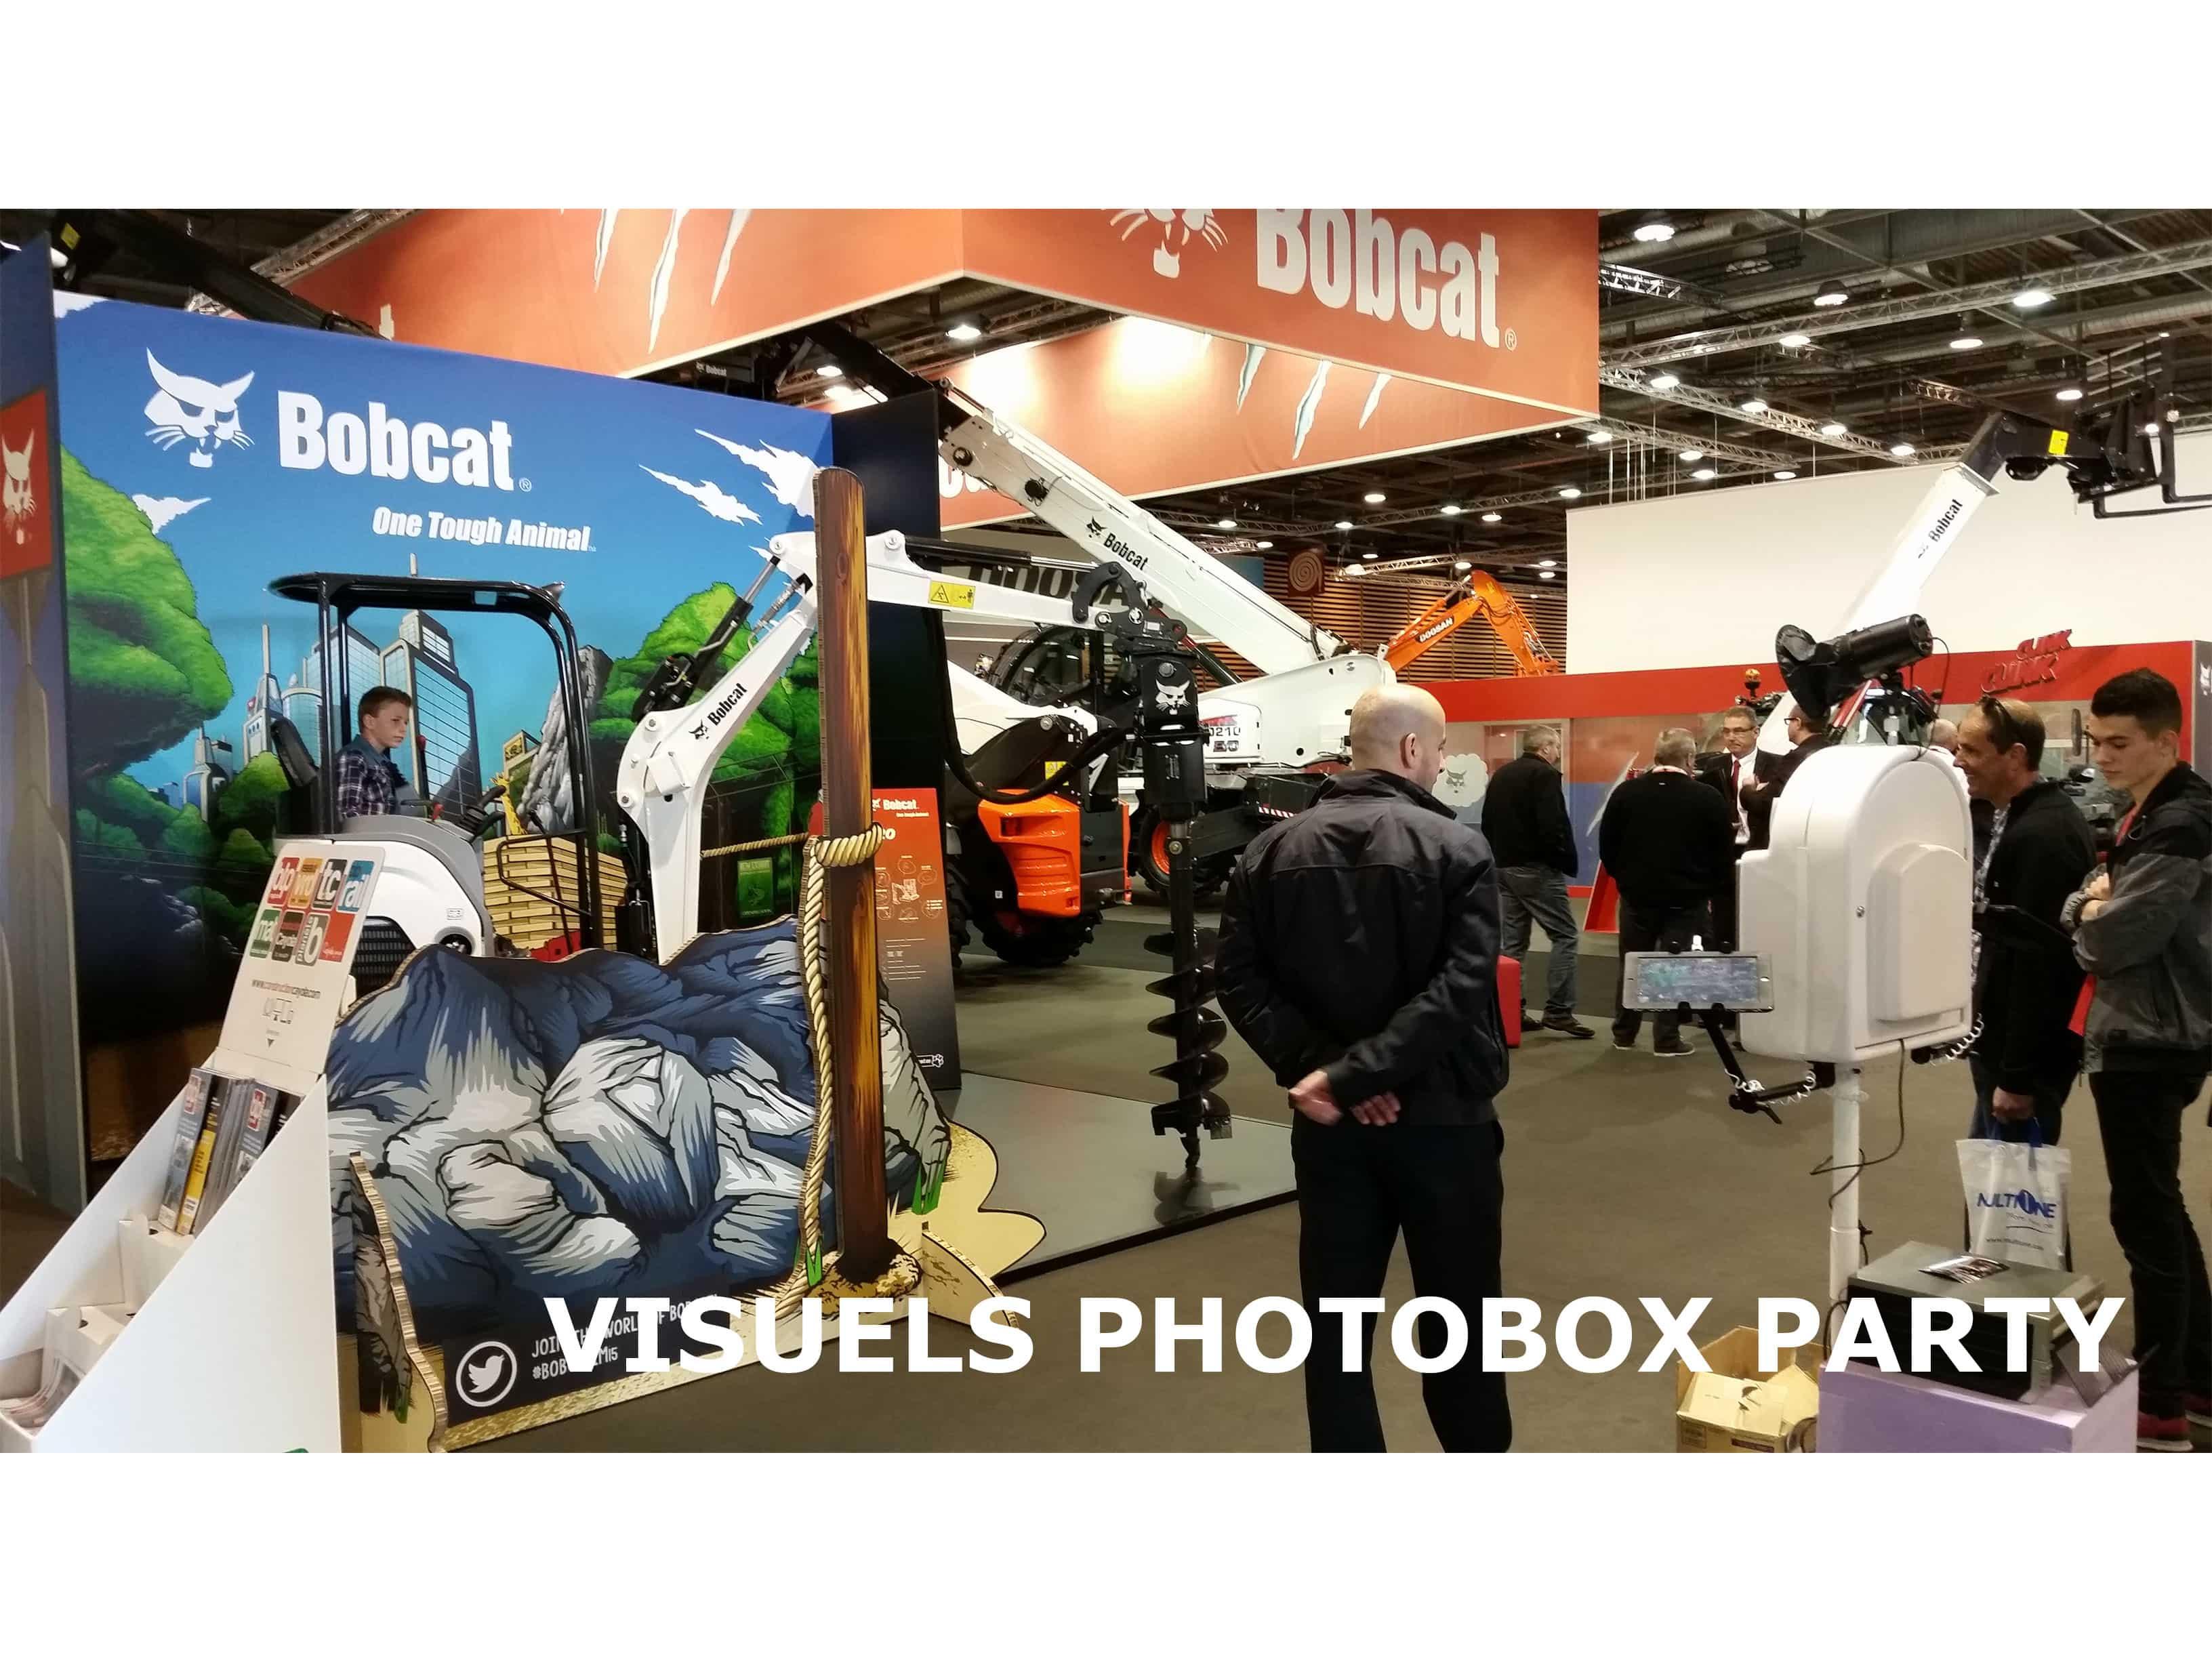 photobooth paris 3 - Photobooth et vidéobooth Paris, Location photomaton